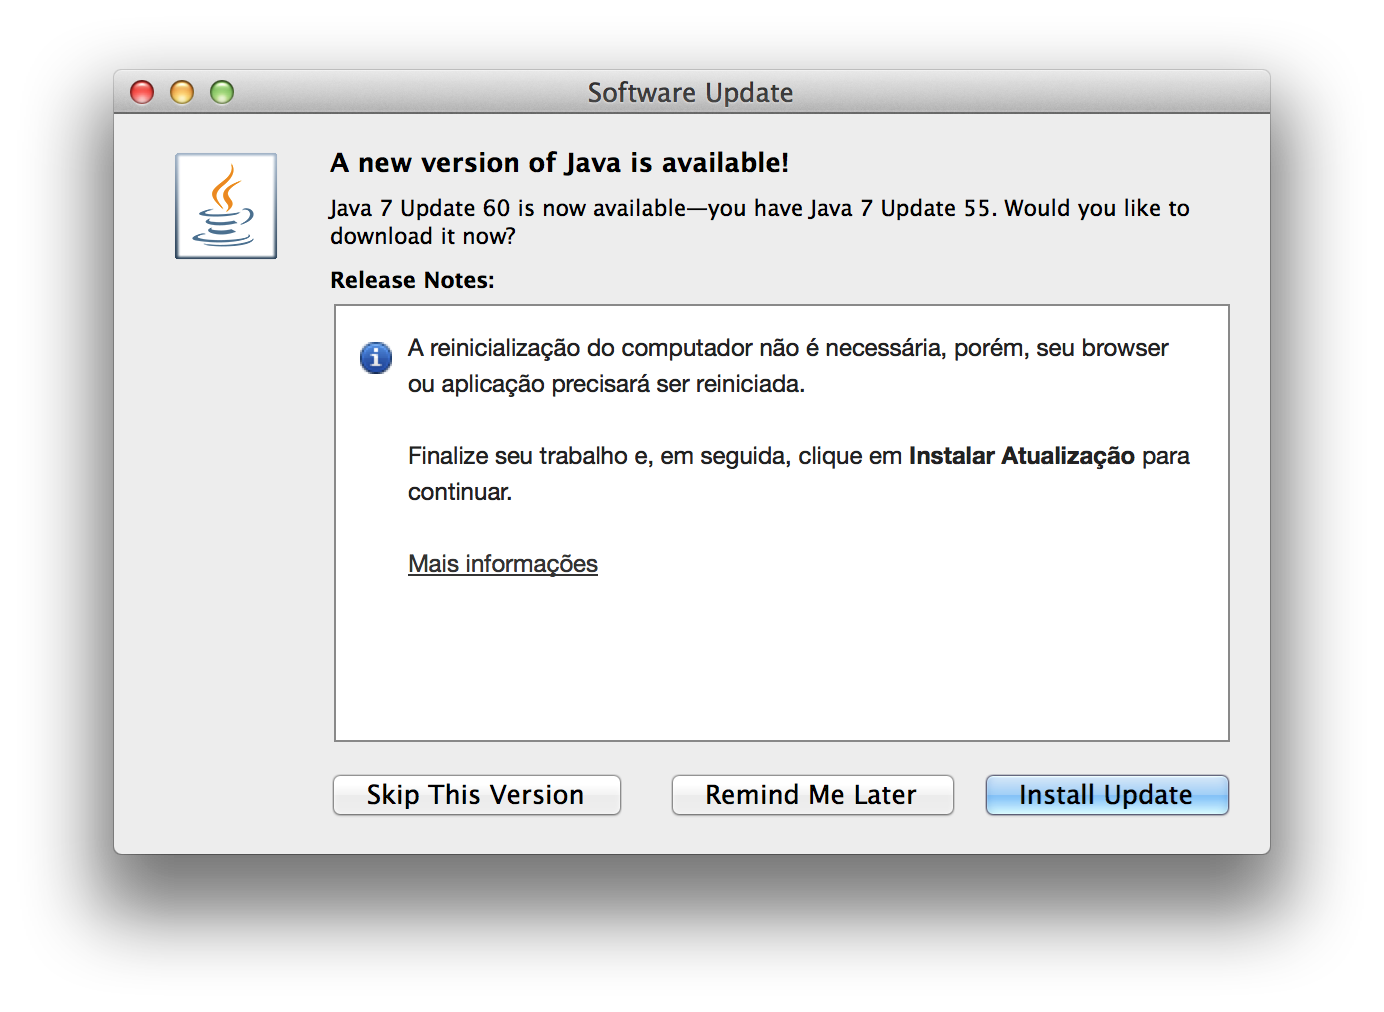 Java 7 Update 60